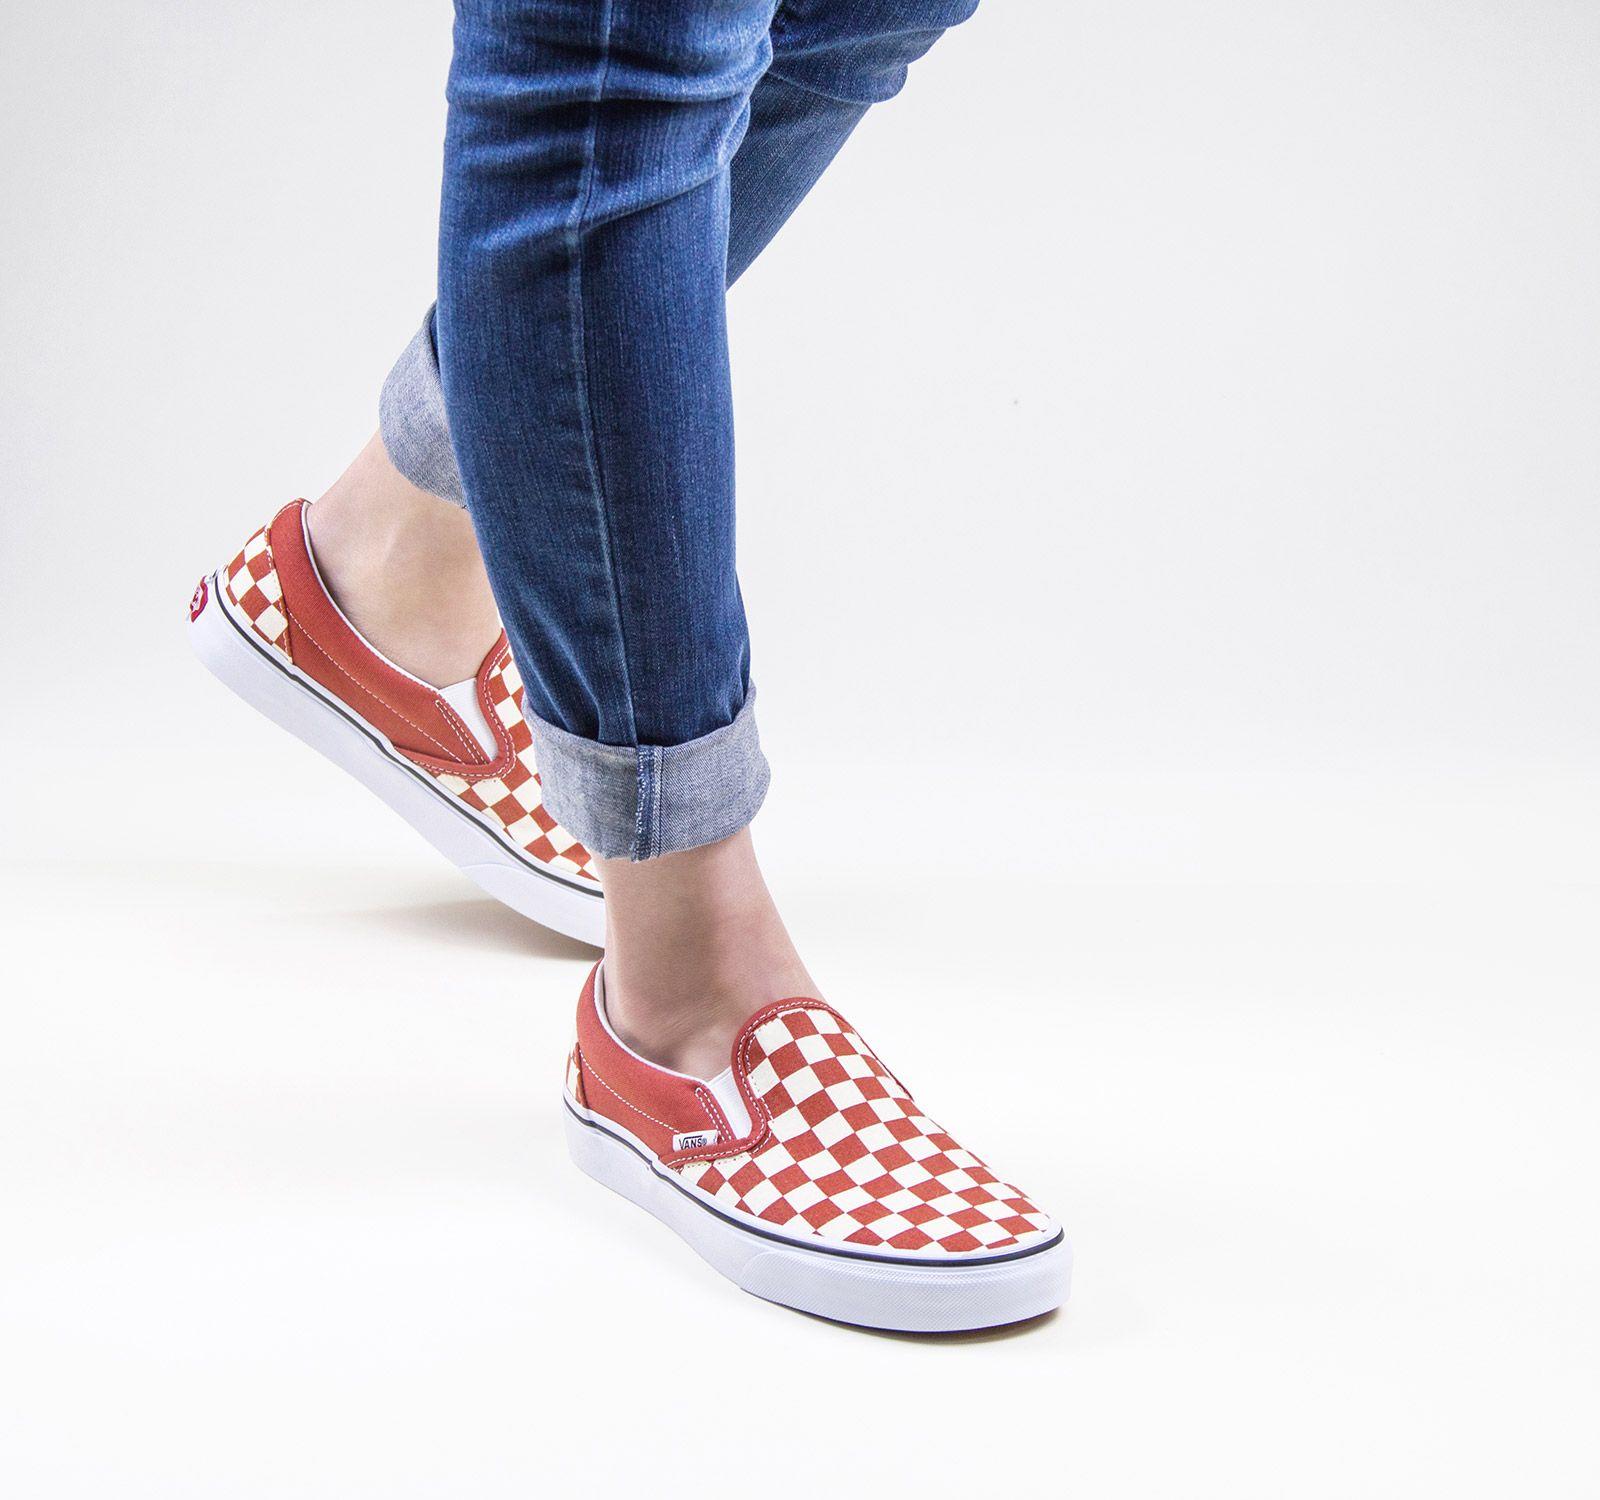 Vans Classic Slip-On Sneaker in Hot Sauce | Vans classic slip on ...